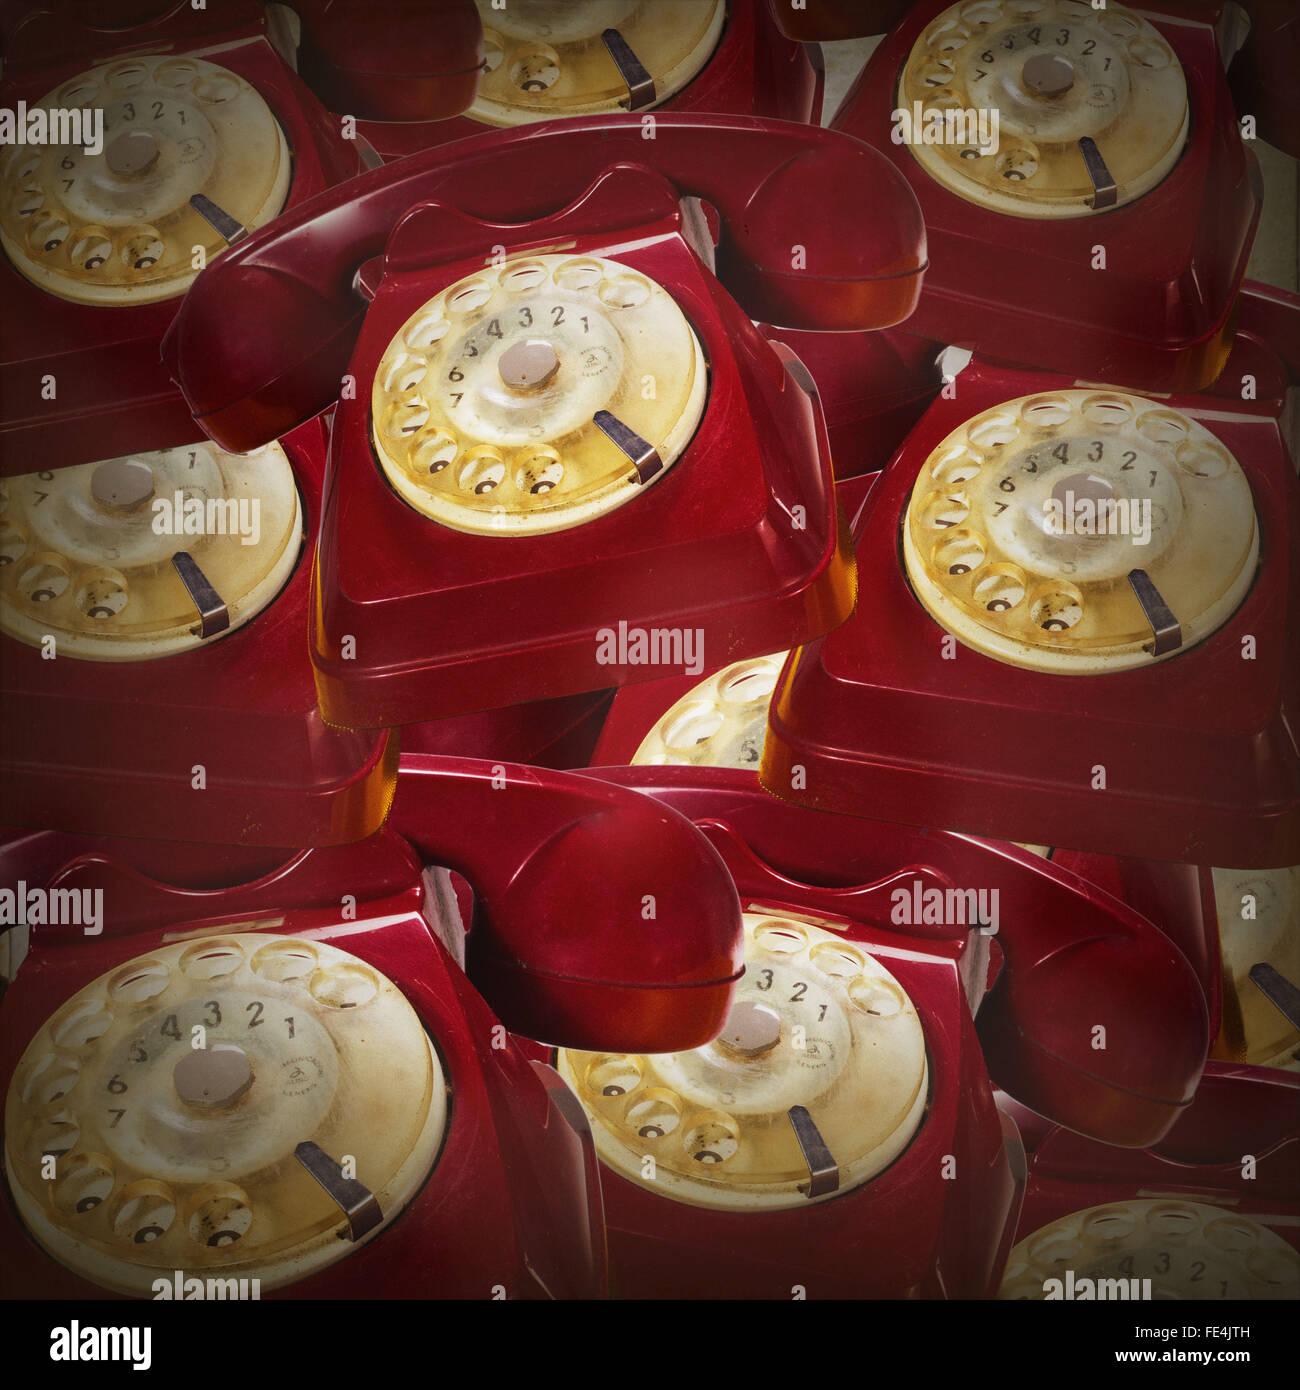 Full Frame Shot Of Red Rotary Phones - Stock Image